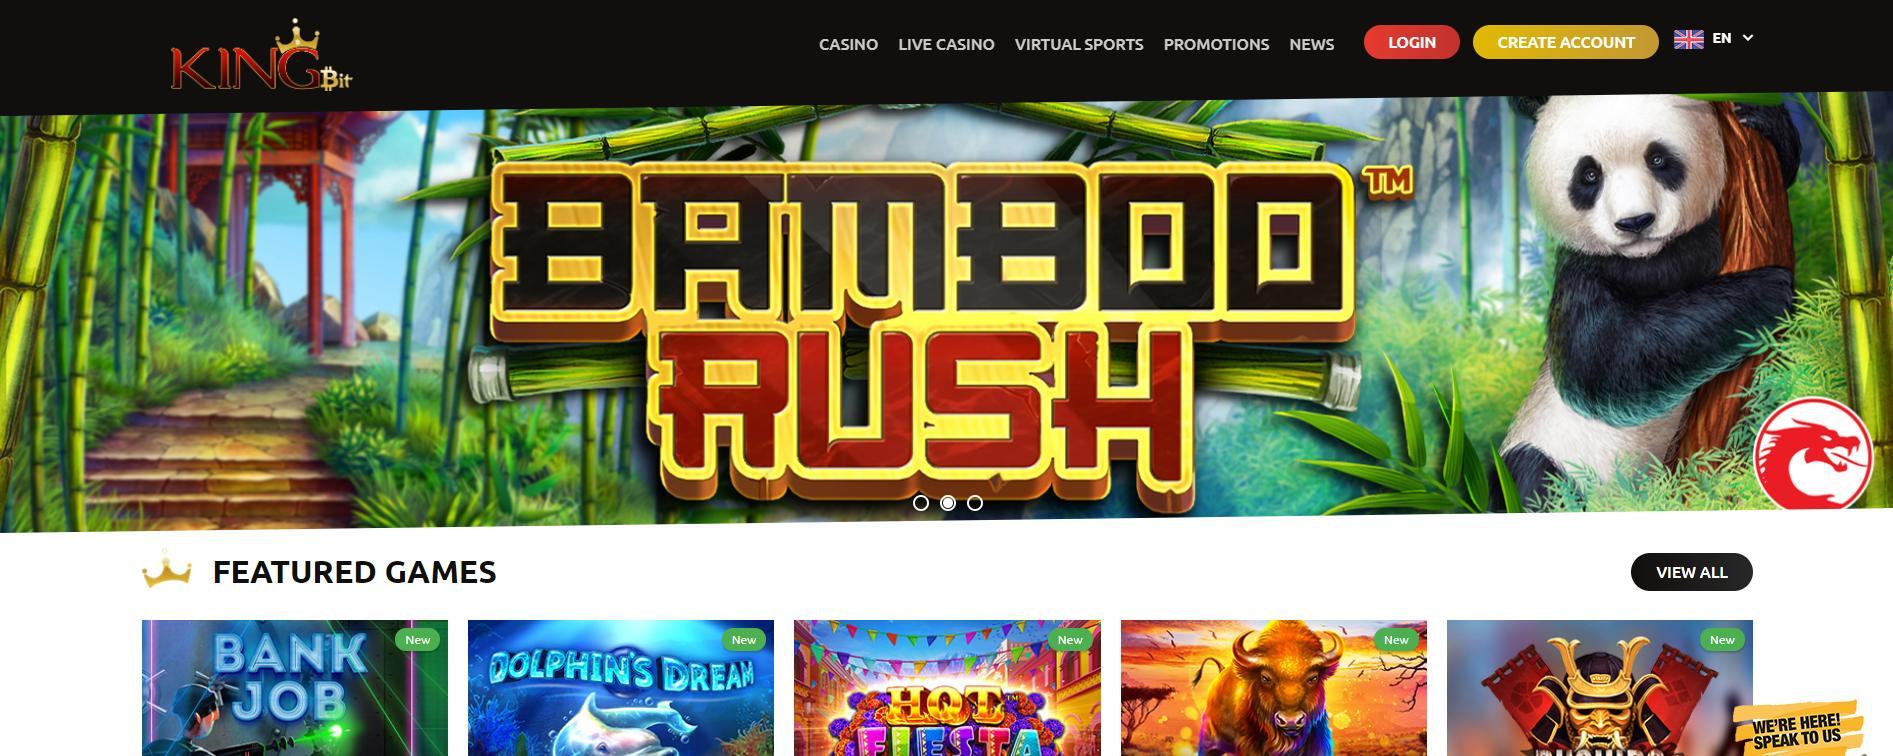 kingbit home page